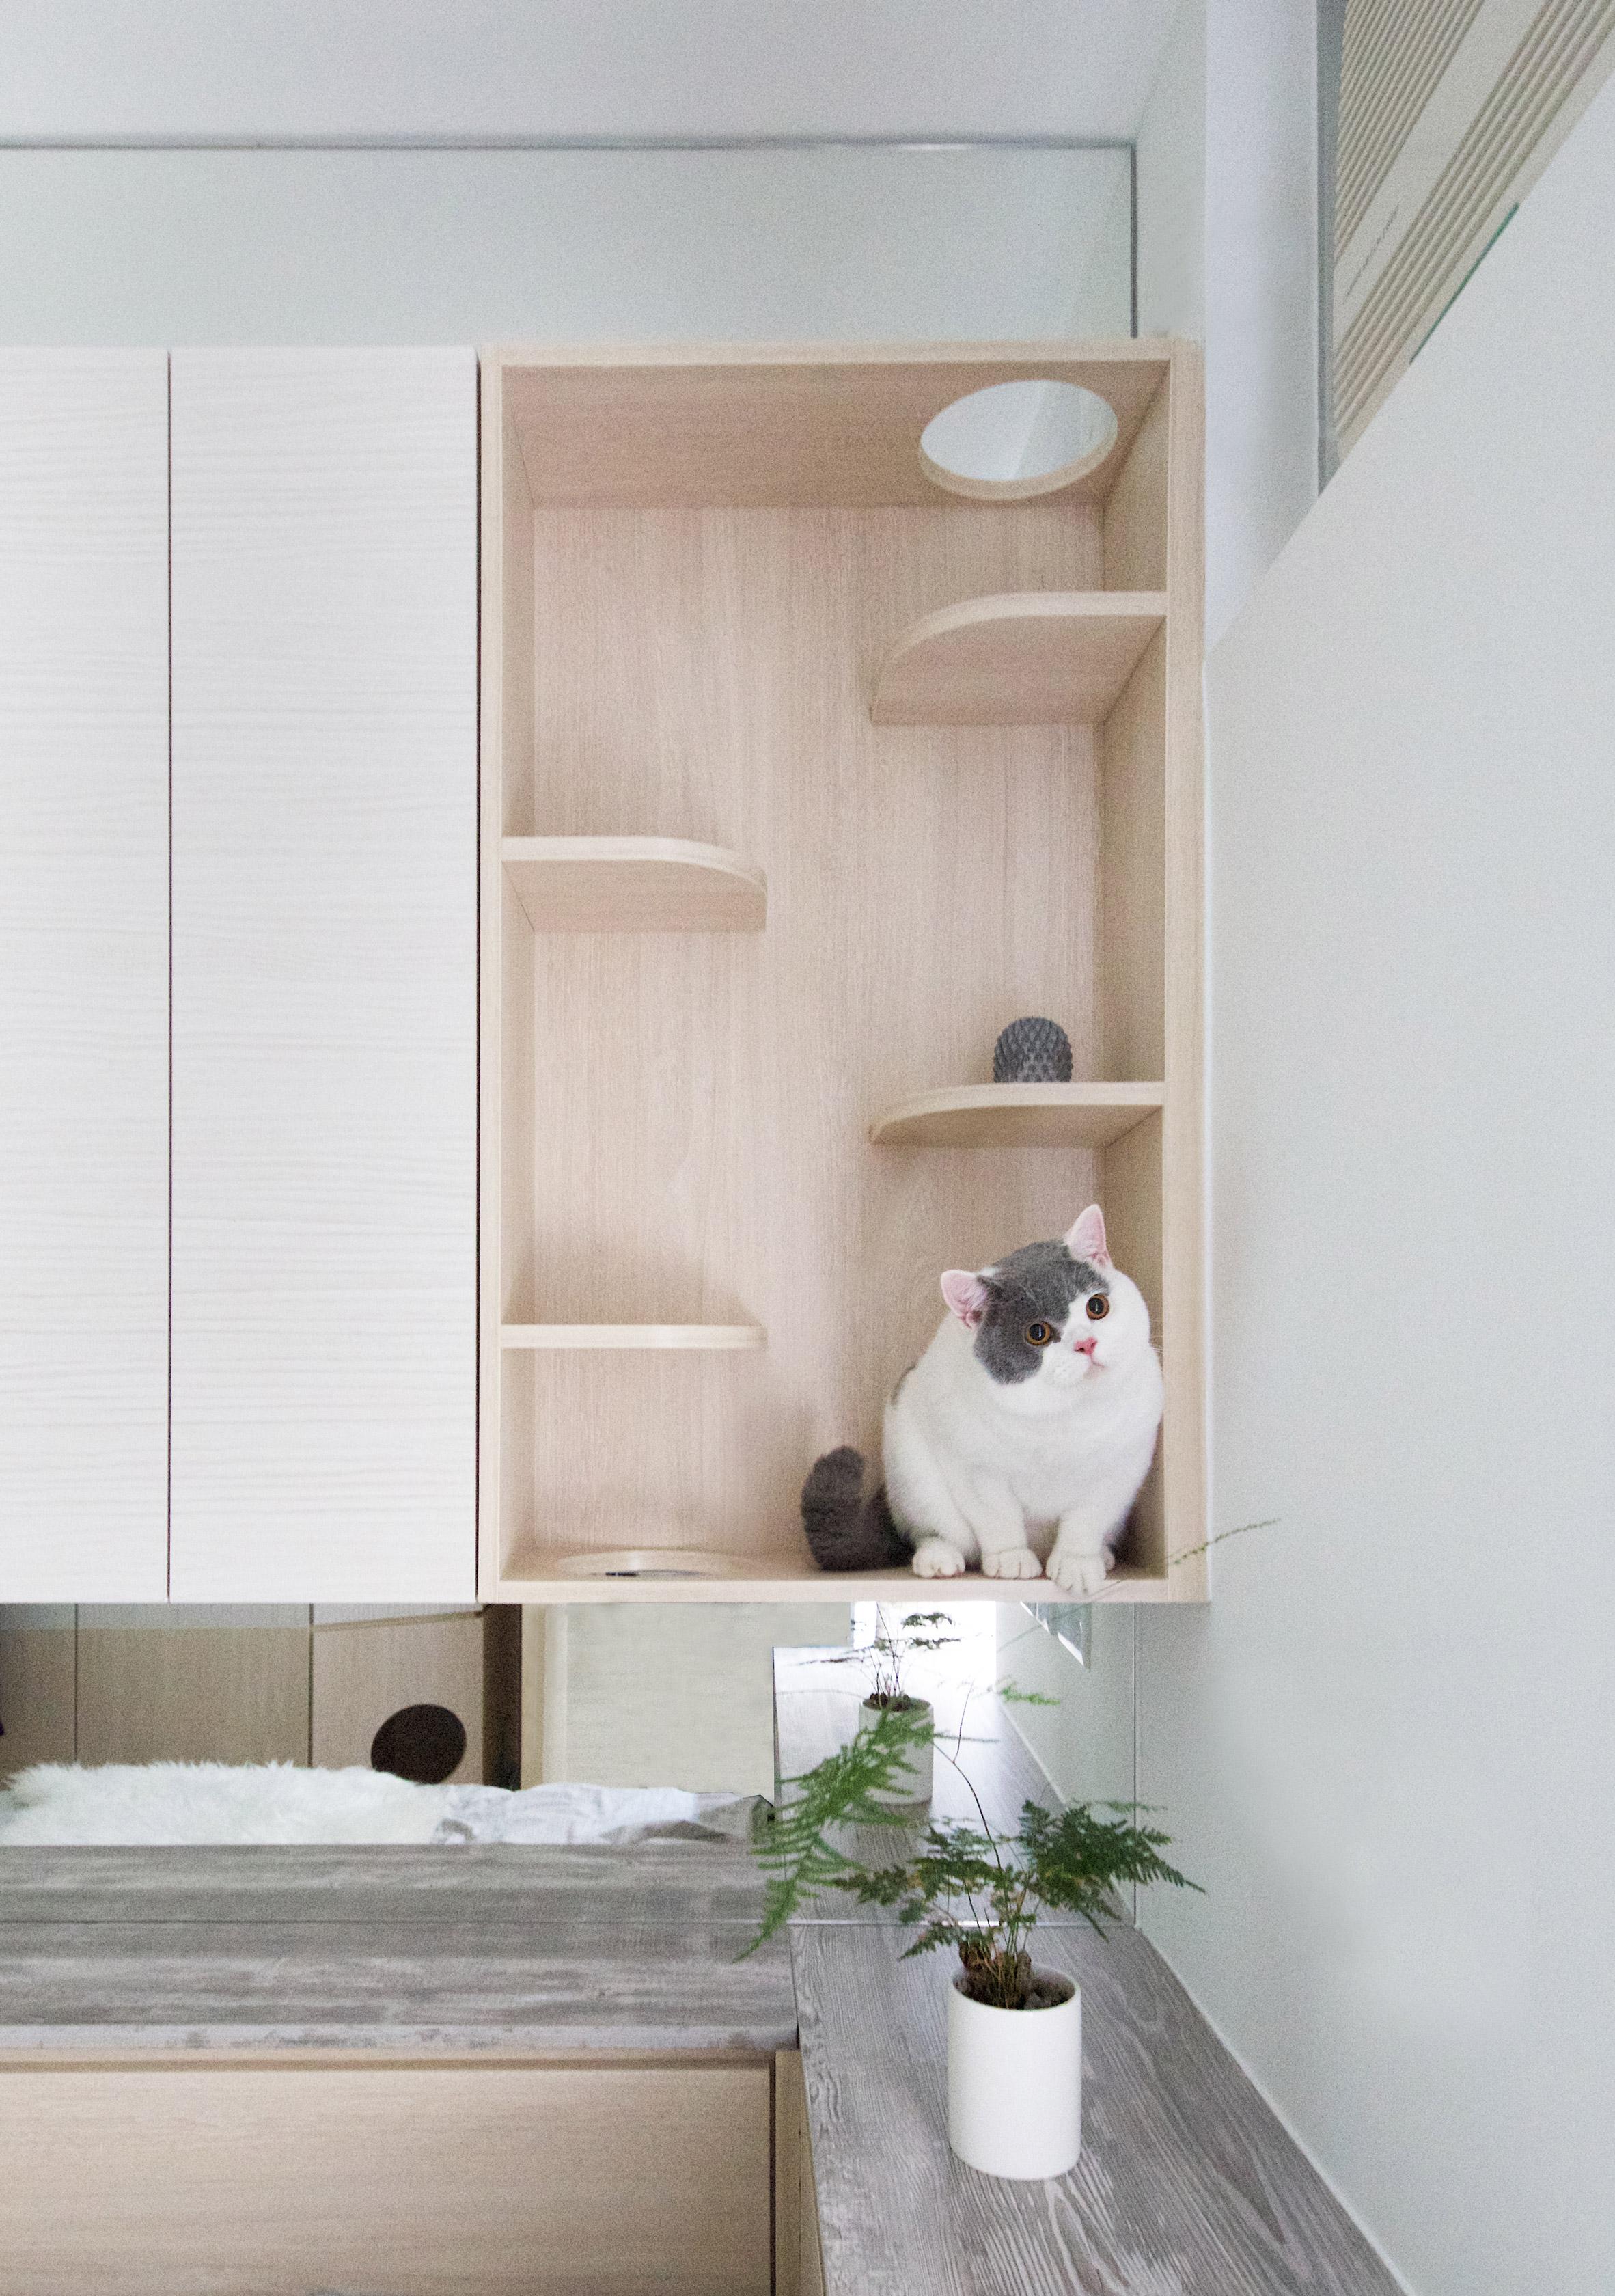 Pets Playground apartment in Hong Kong by Sim-Plex Design Studio